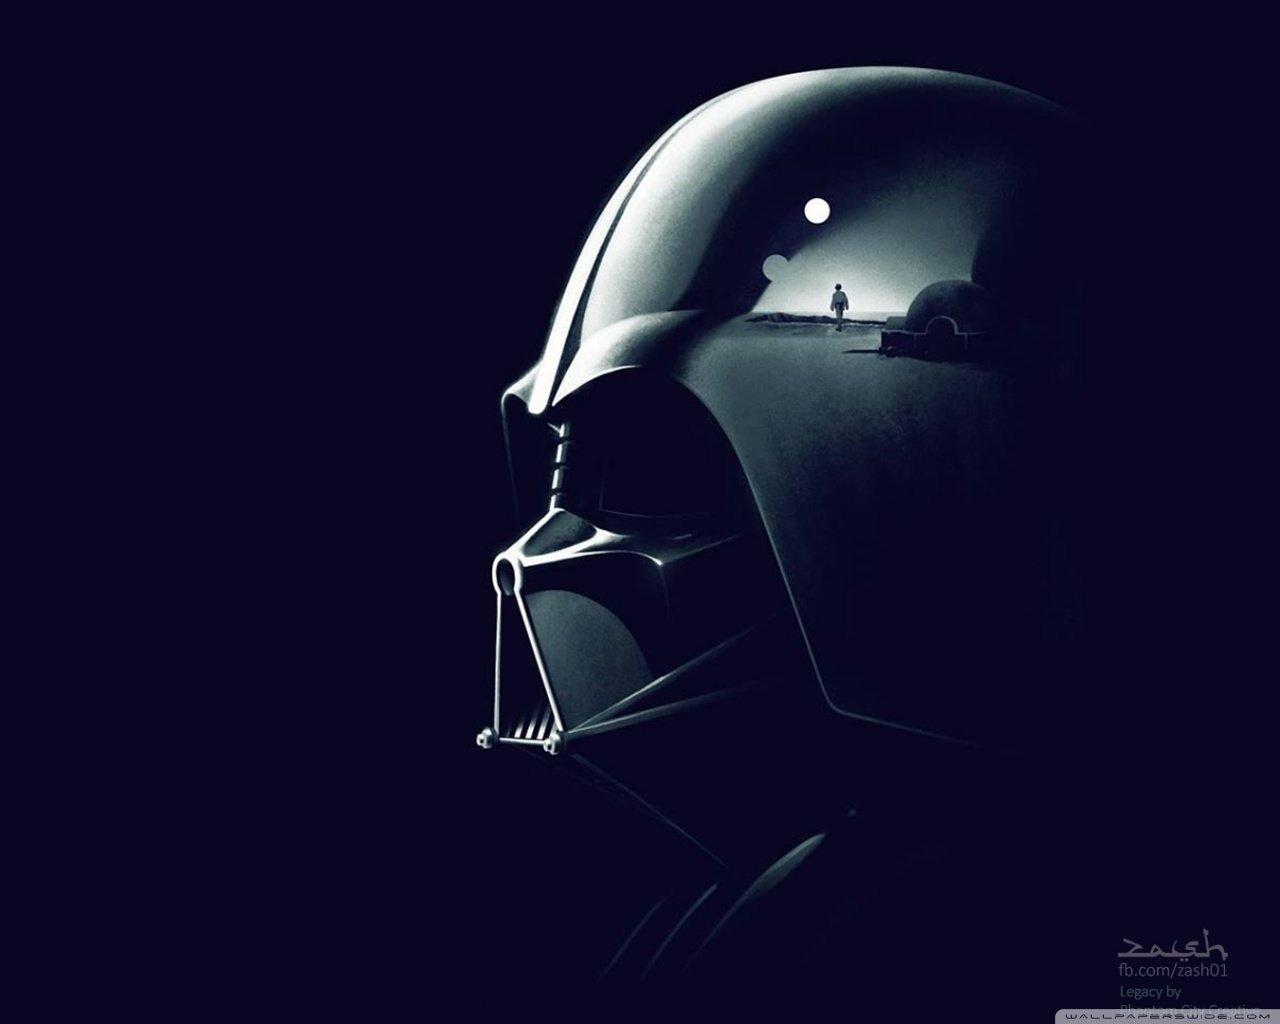 Star Wars Wallpaper Phone 4k Darth Vader Wallpaper 4k 1280x1024 Download Hd Wallpaper Wallpapertip